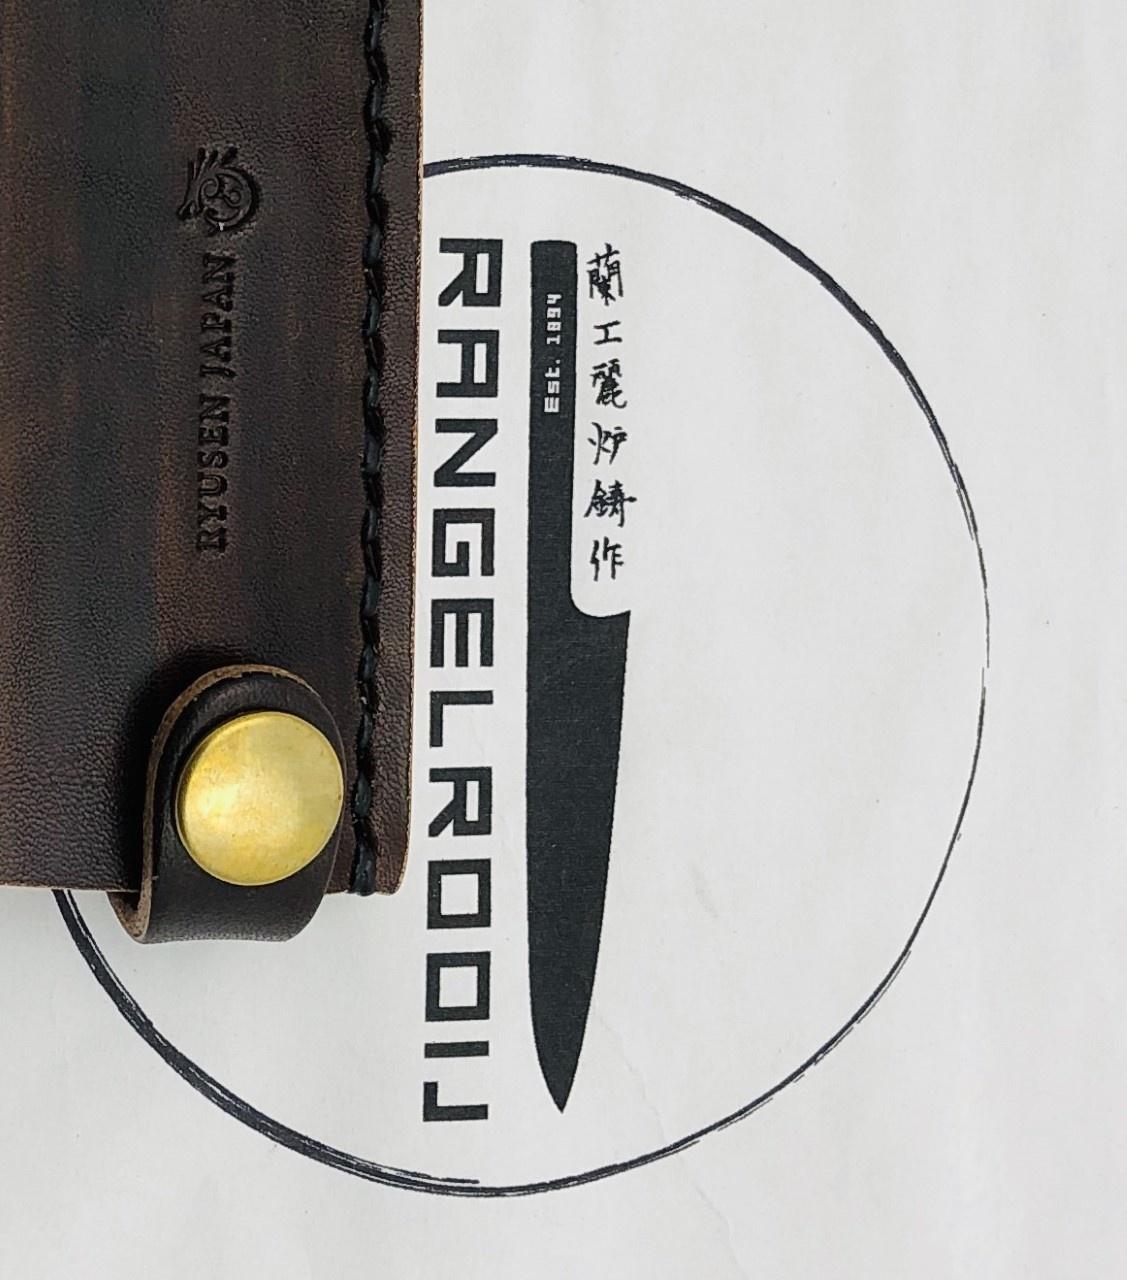 RYUSEN leather sheath LS-207 135 mm petty Brown